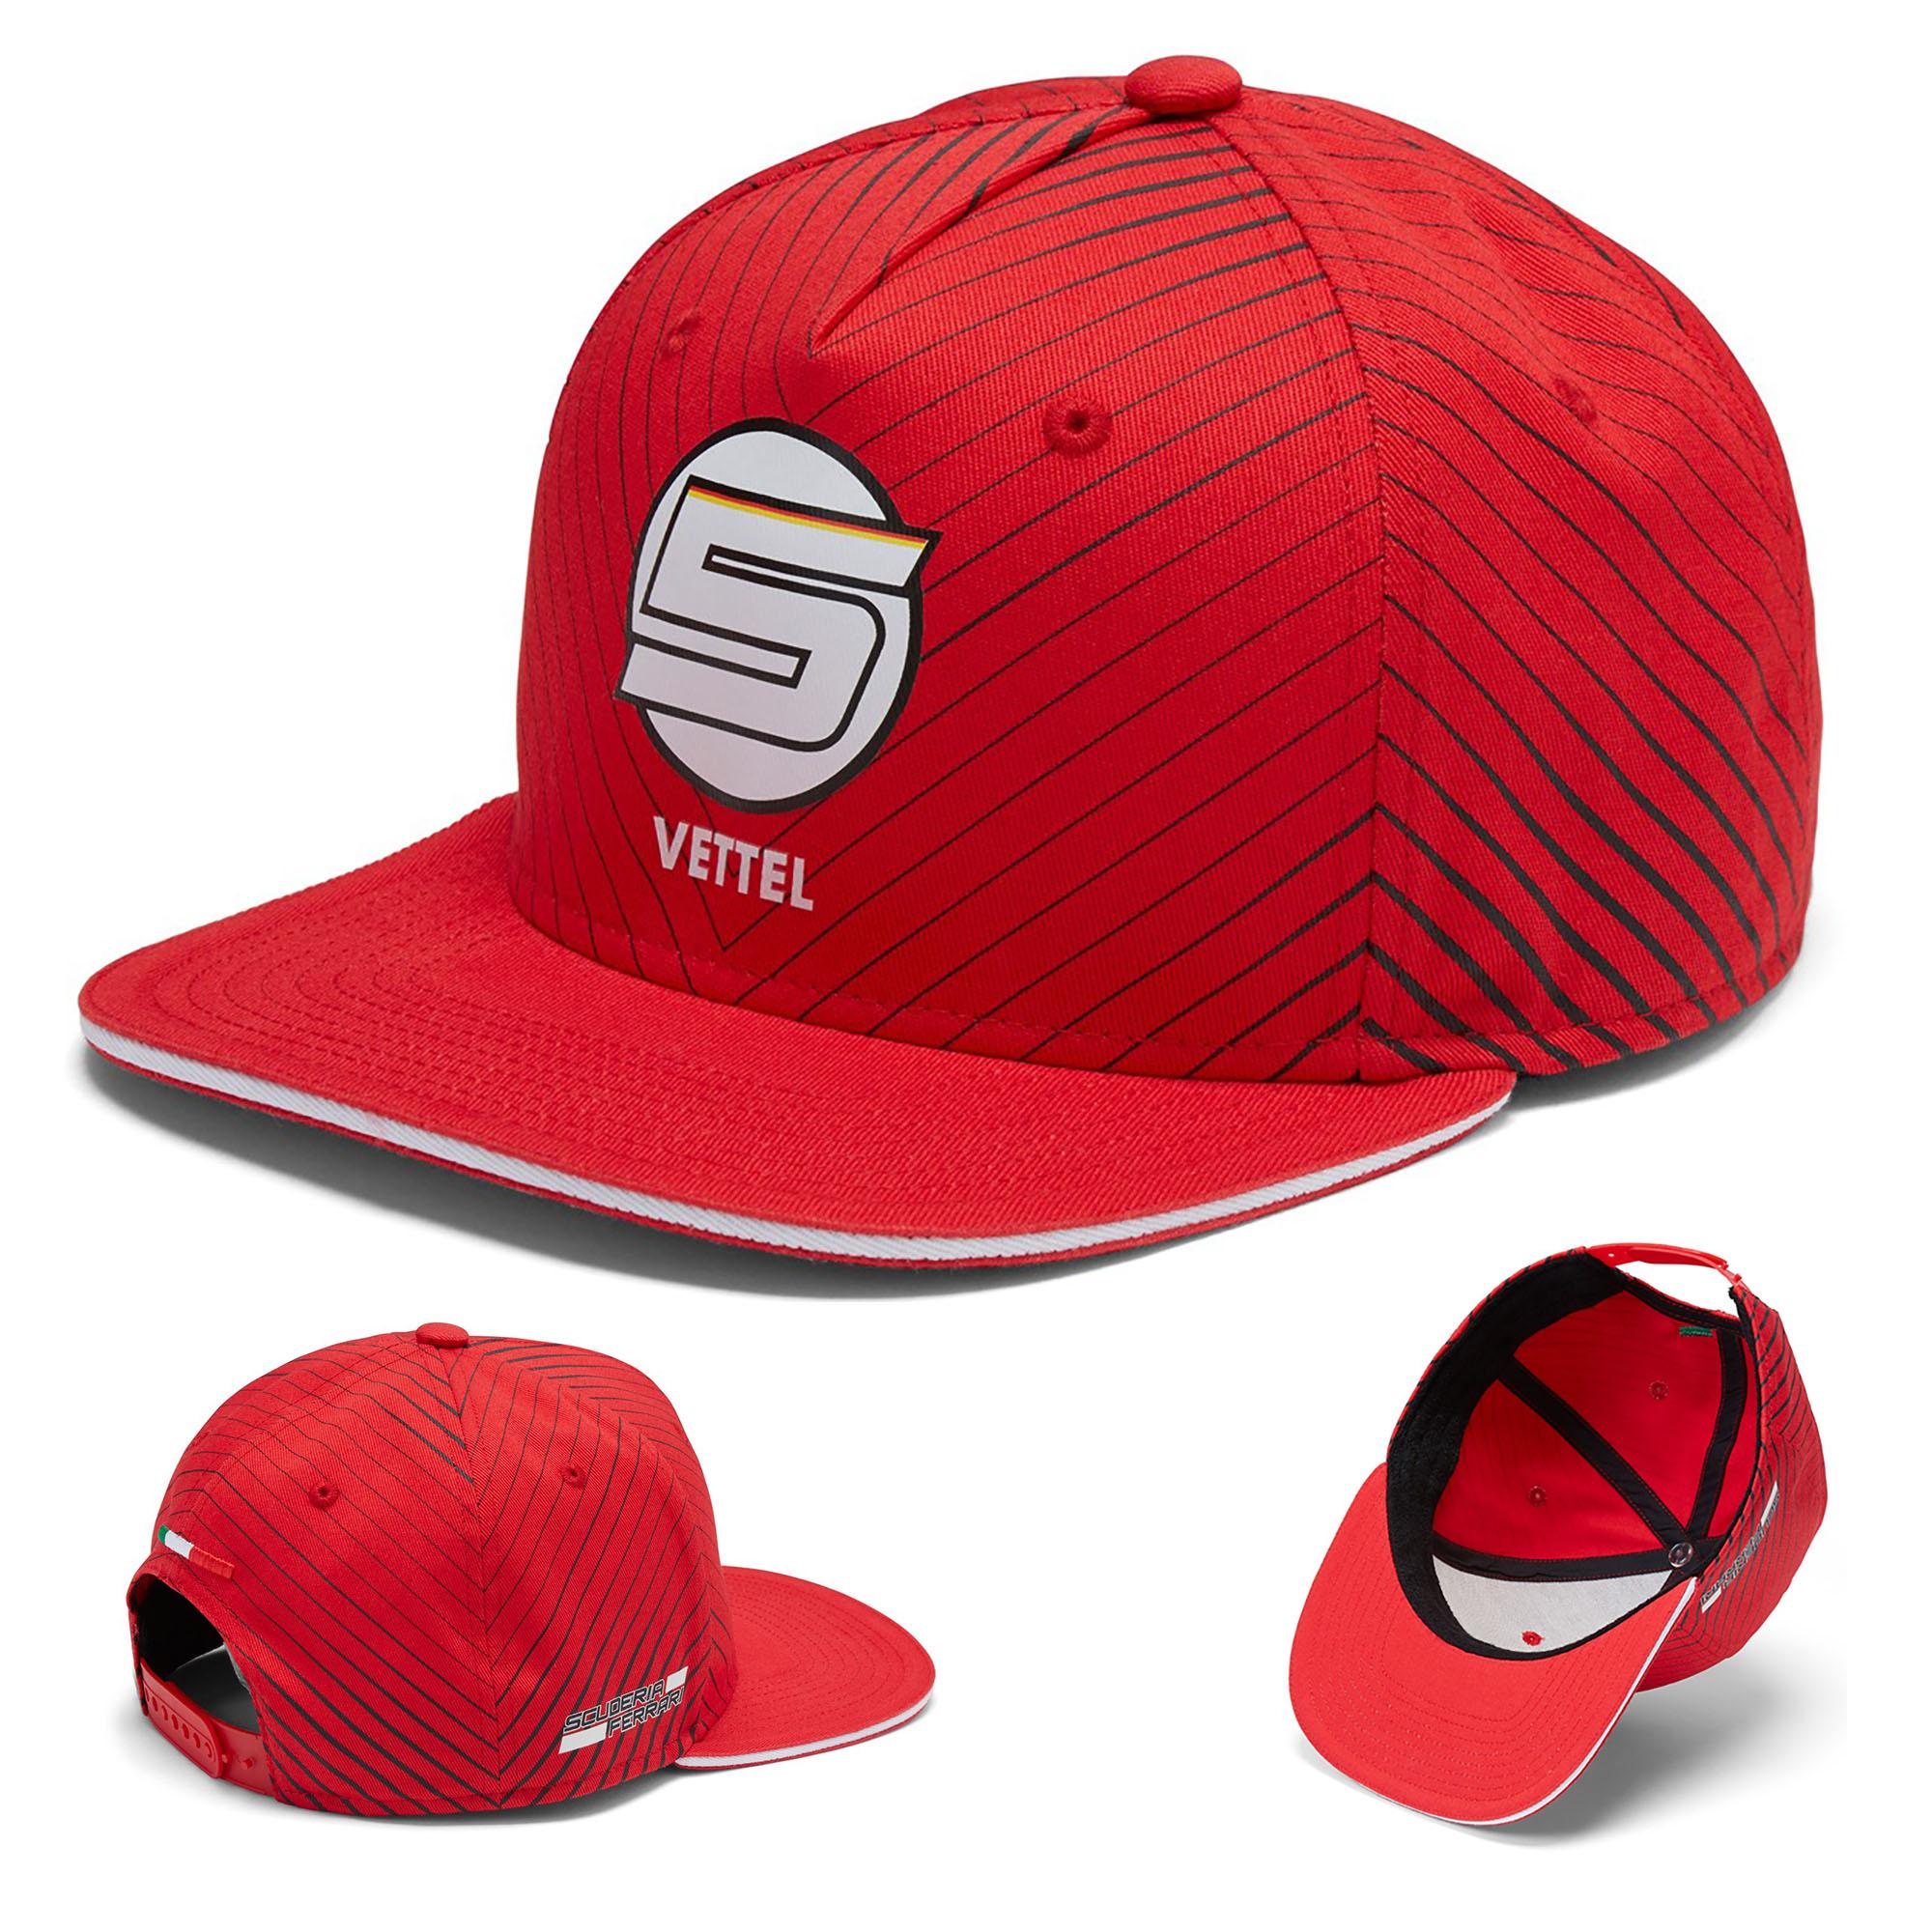 13eb512e Ferrari 2018 Sebastian Vettel #5 Adult Flatbrim Cap Official Team  Merchandise